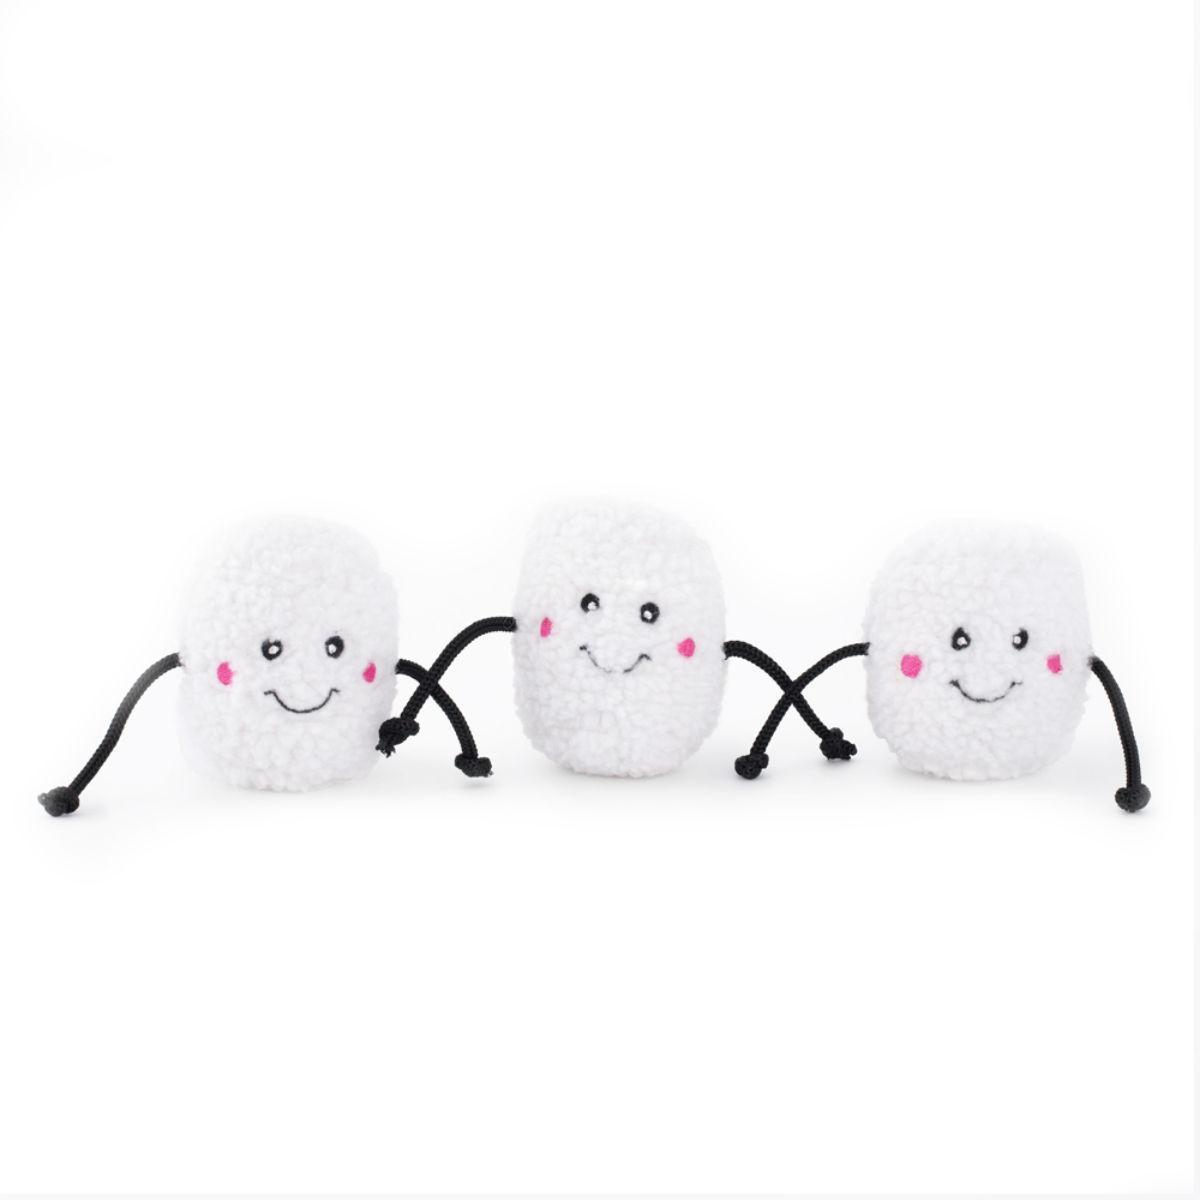 ZippyPaws Holiday Miniz Dog Toys - Marshmallows